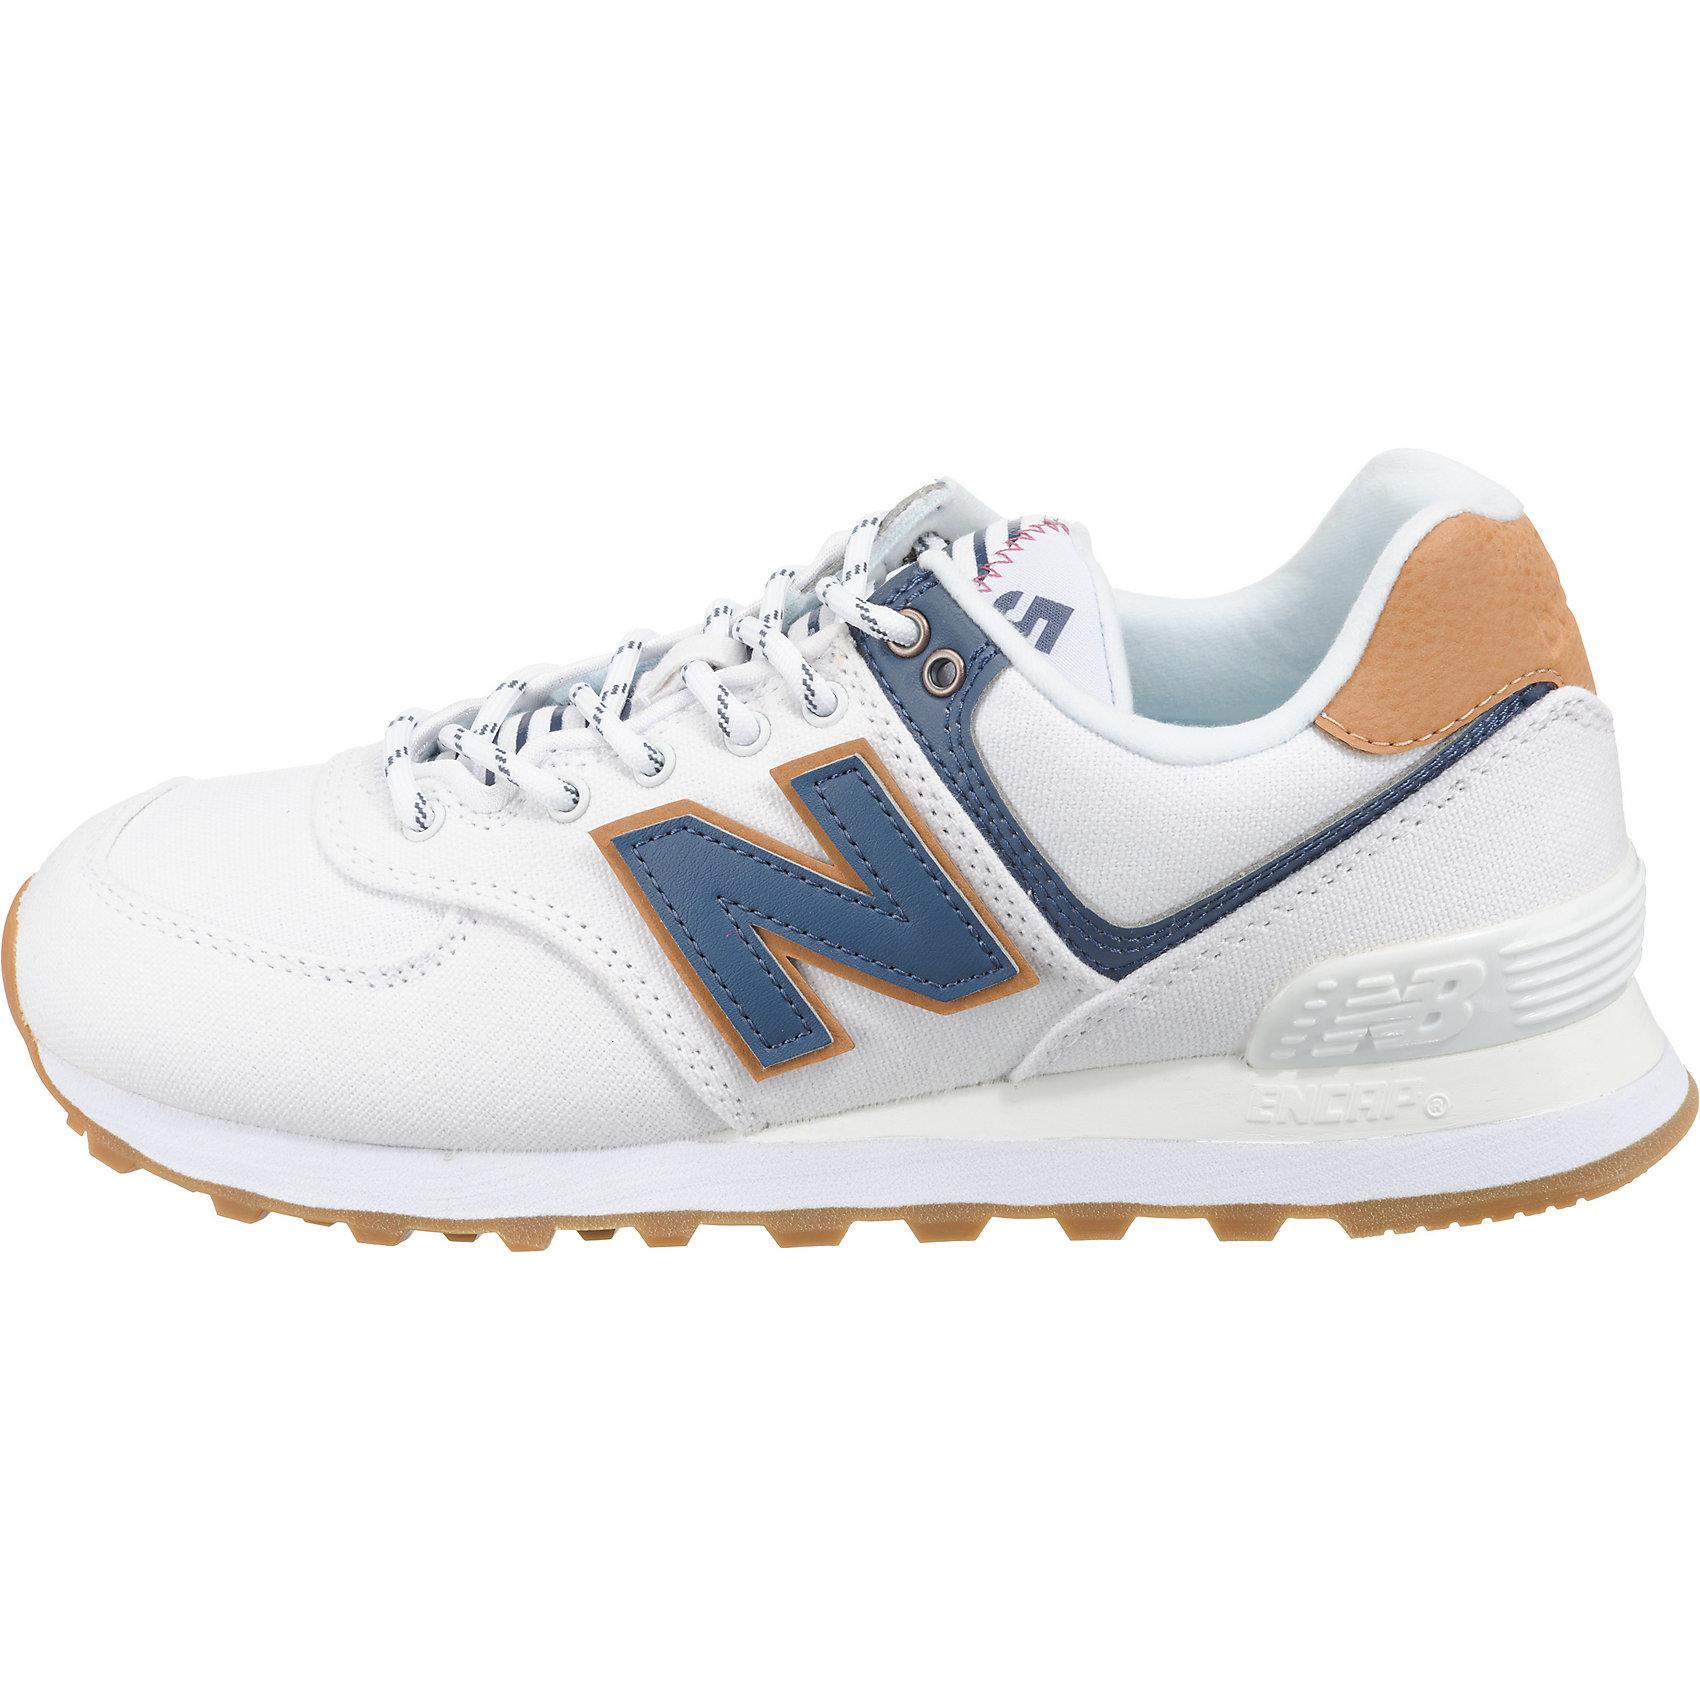 7397638 Blau Für Balance Damen New Neu Wl574 Sneakers Low Weiß B NnwOyvm80P